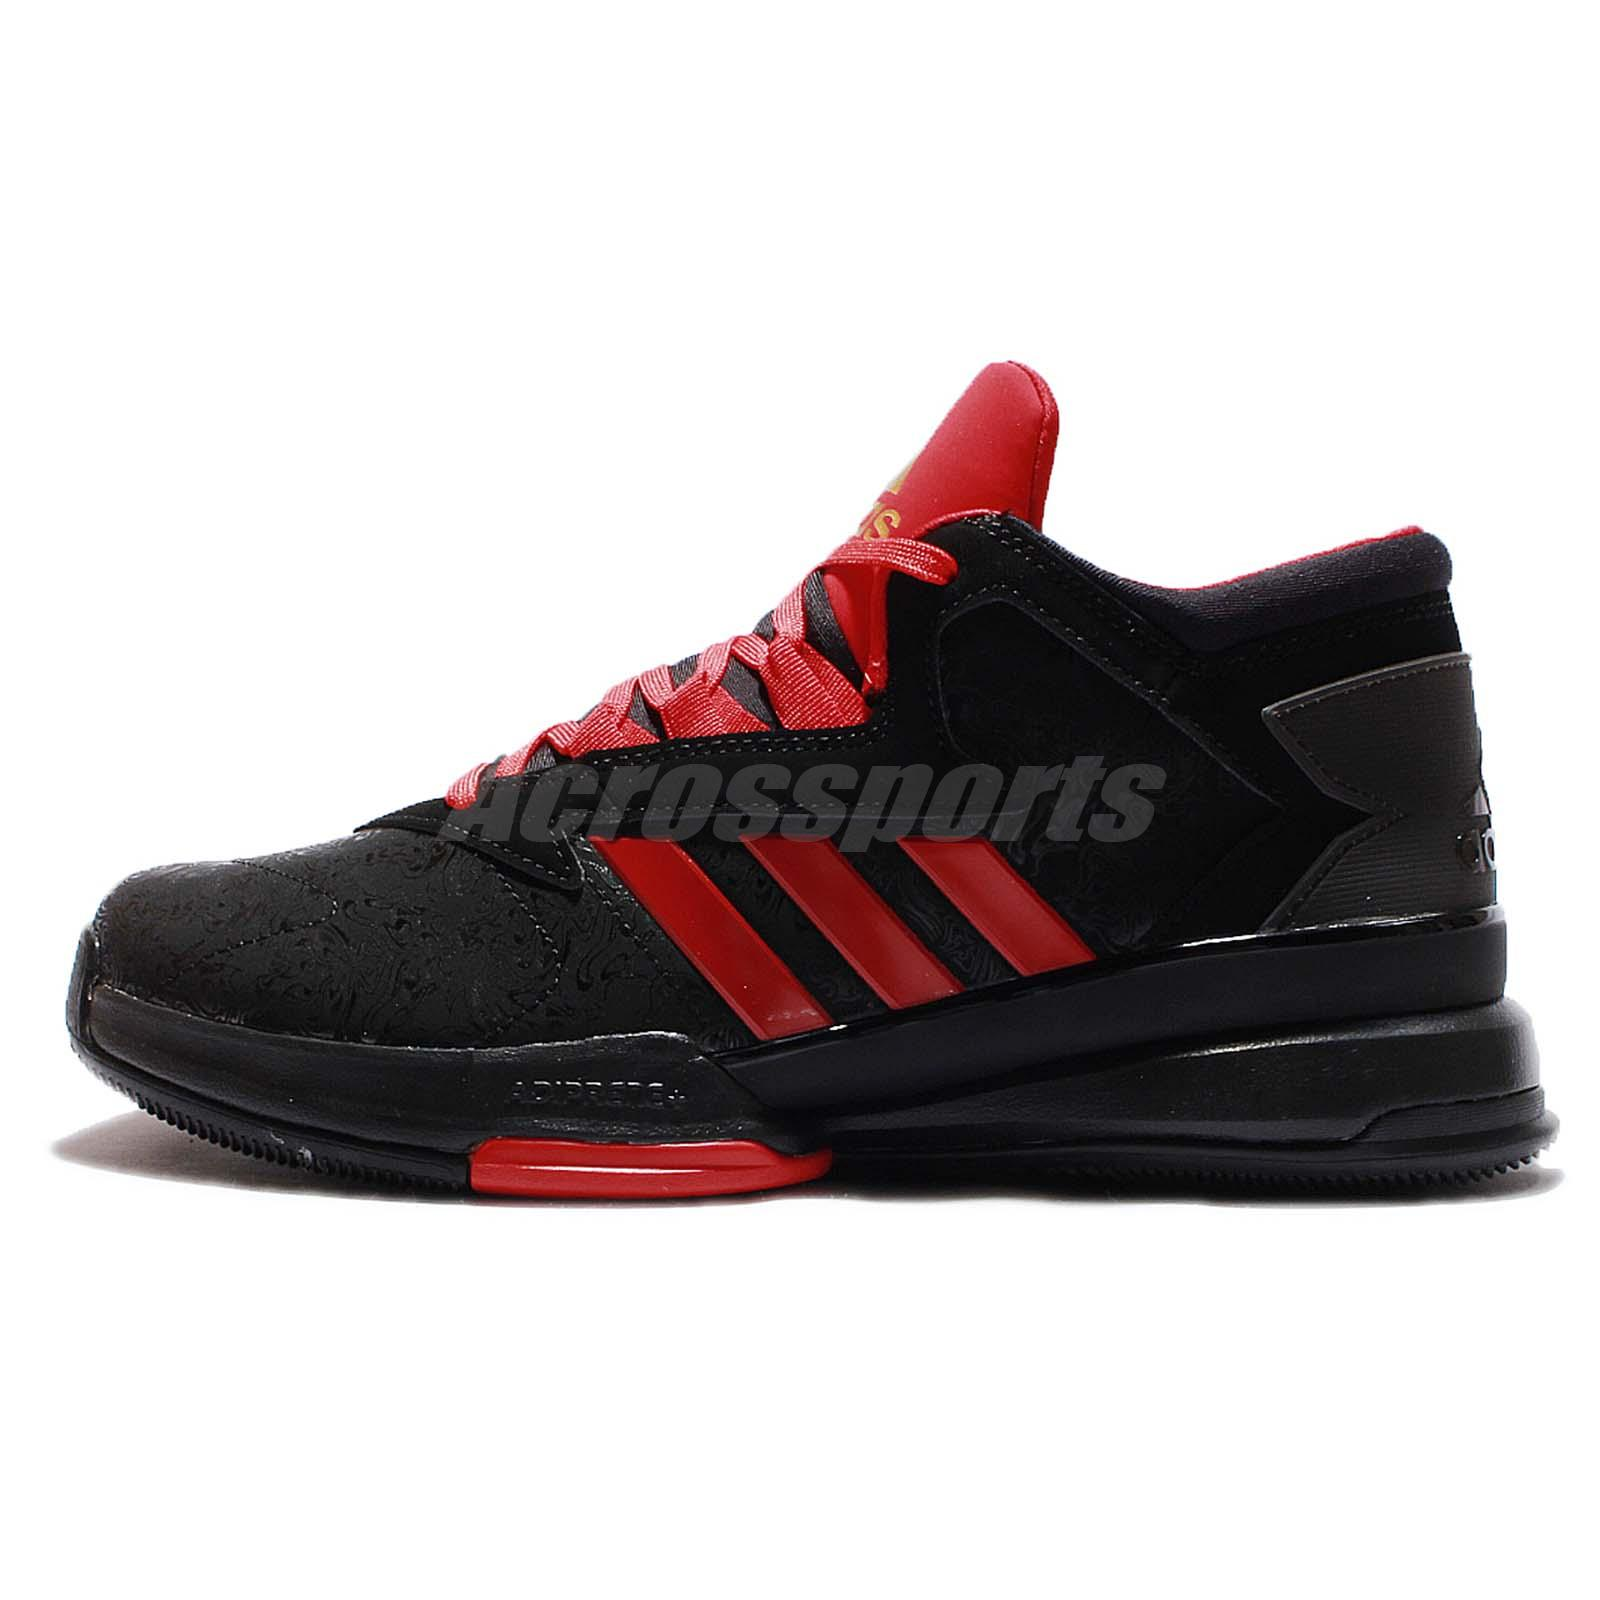 adidas street jam ii 2 rosso uomini scarpe da basket.